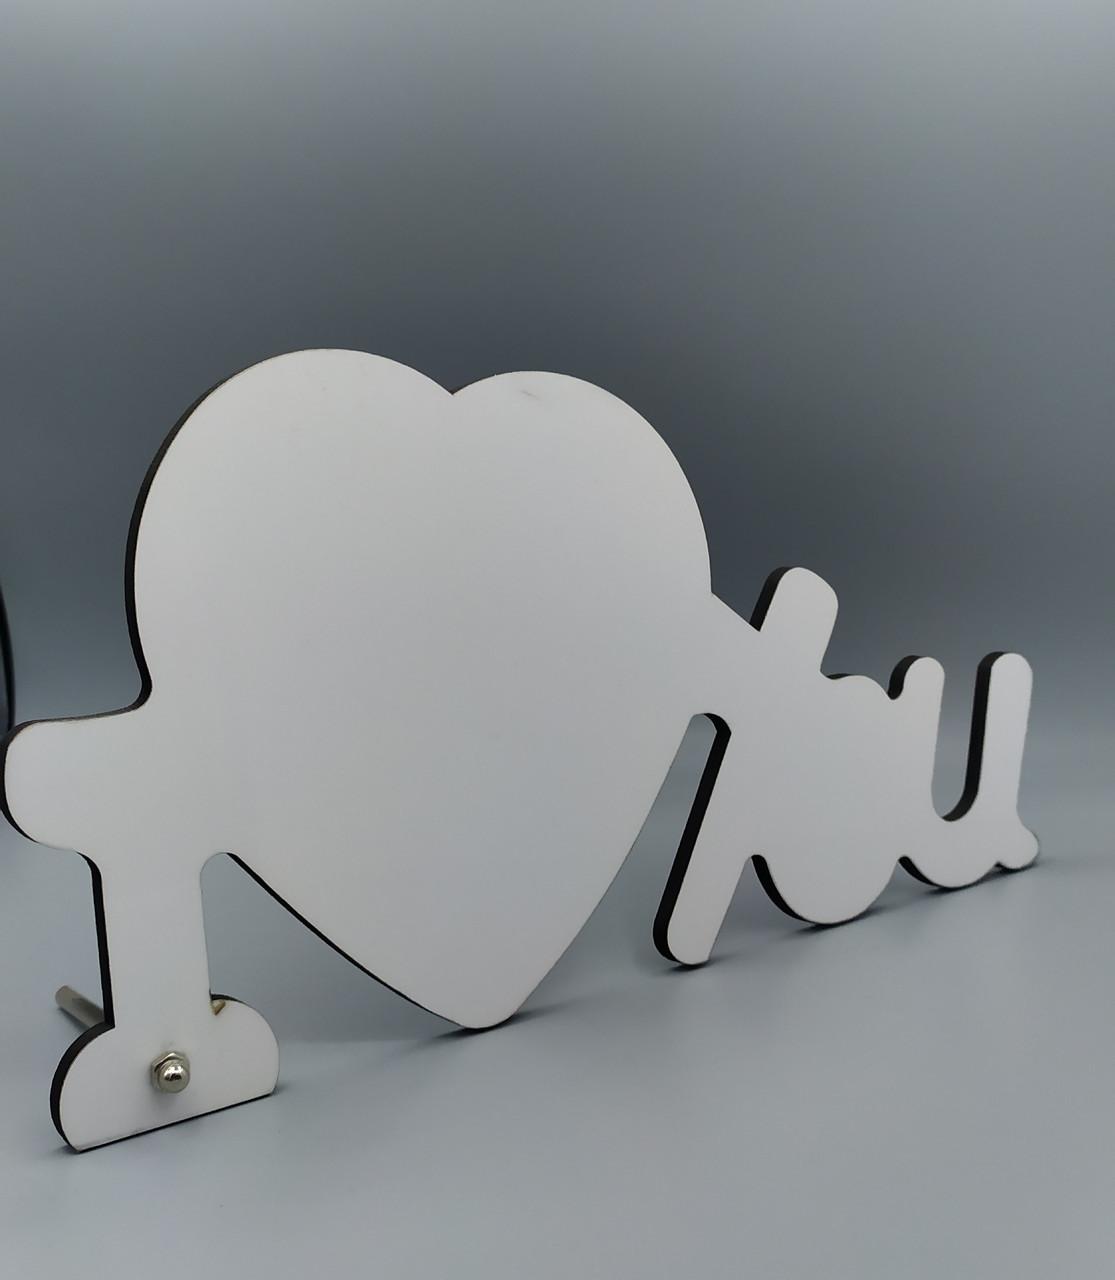 Рамка МДФ для сублимации (I LOVE You), размер 280х180х5мм